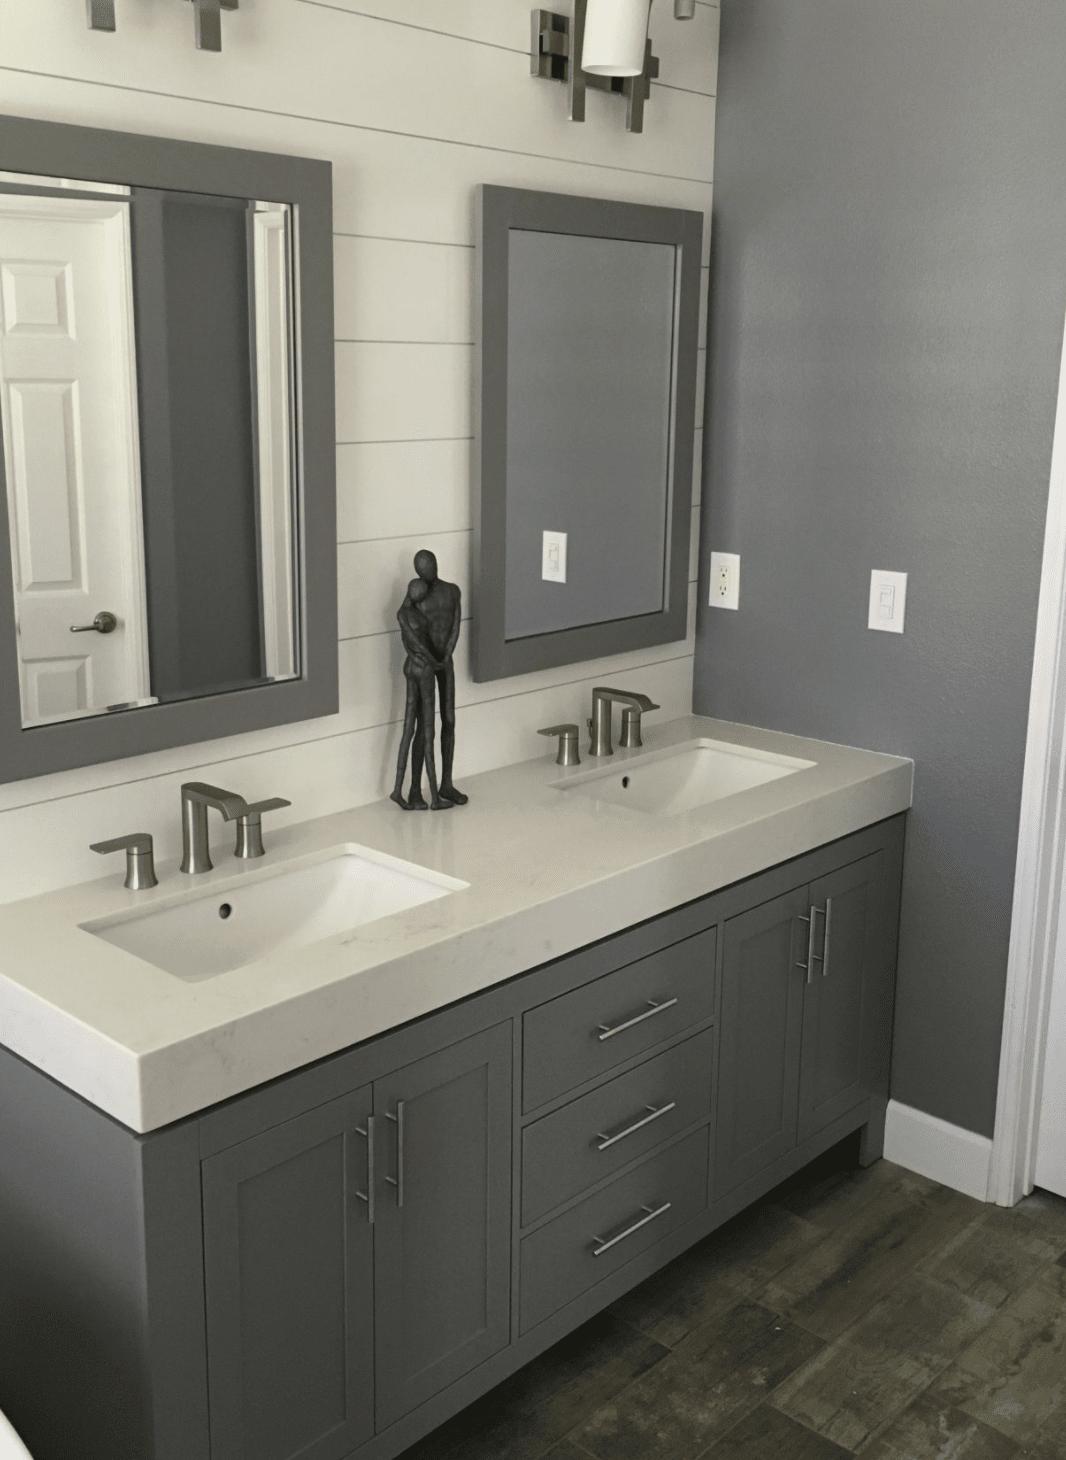 Bathroom Remodeling in Orange, CA from TS Home Design Center / Rite Loom Flooring